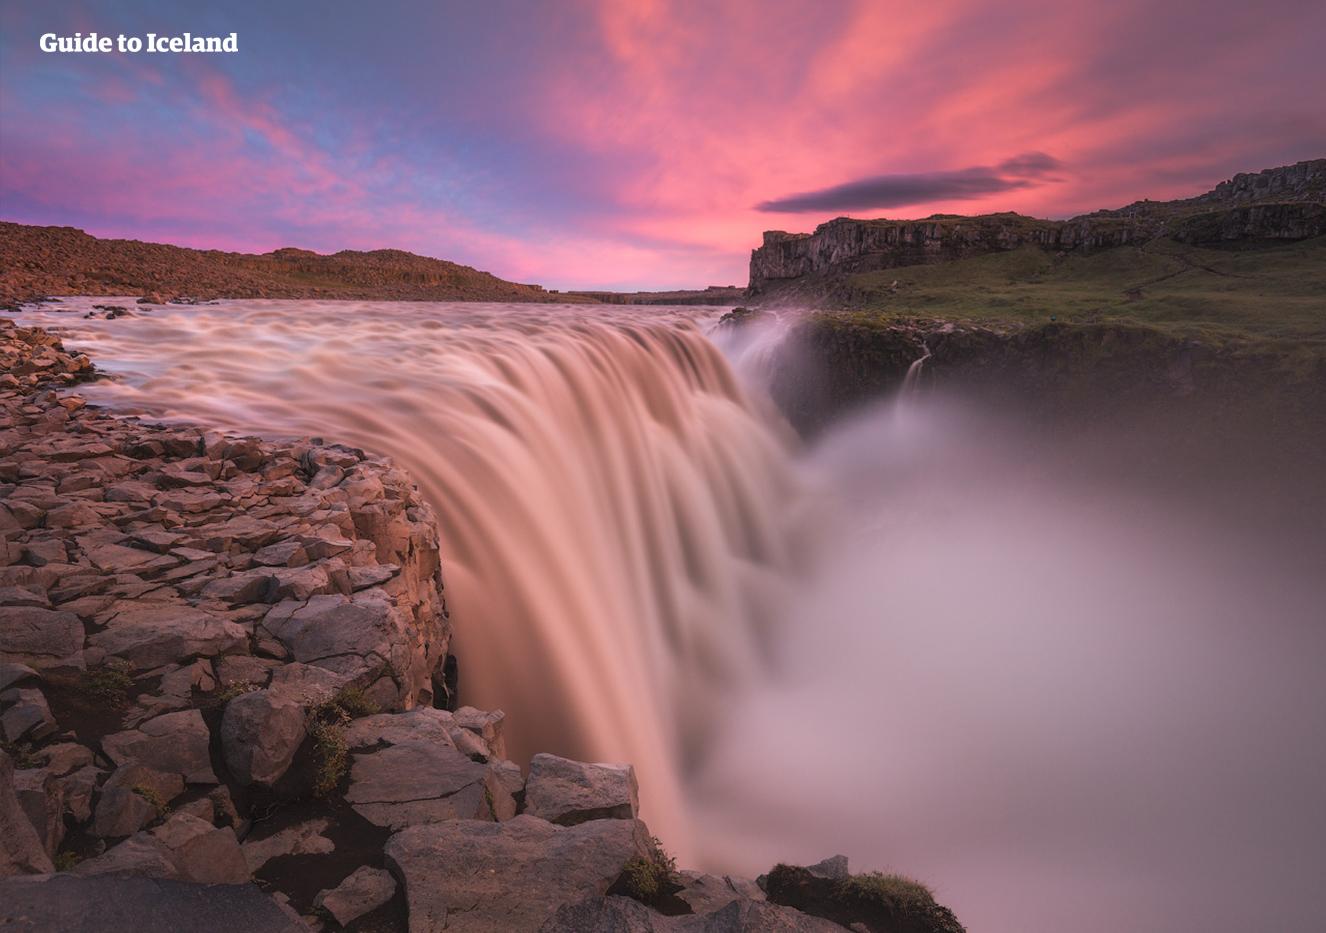 La cascade de Dettifoss est facilement accessible depuis Akureyri.